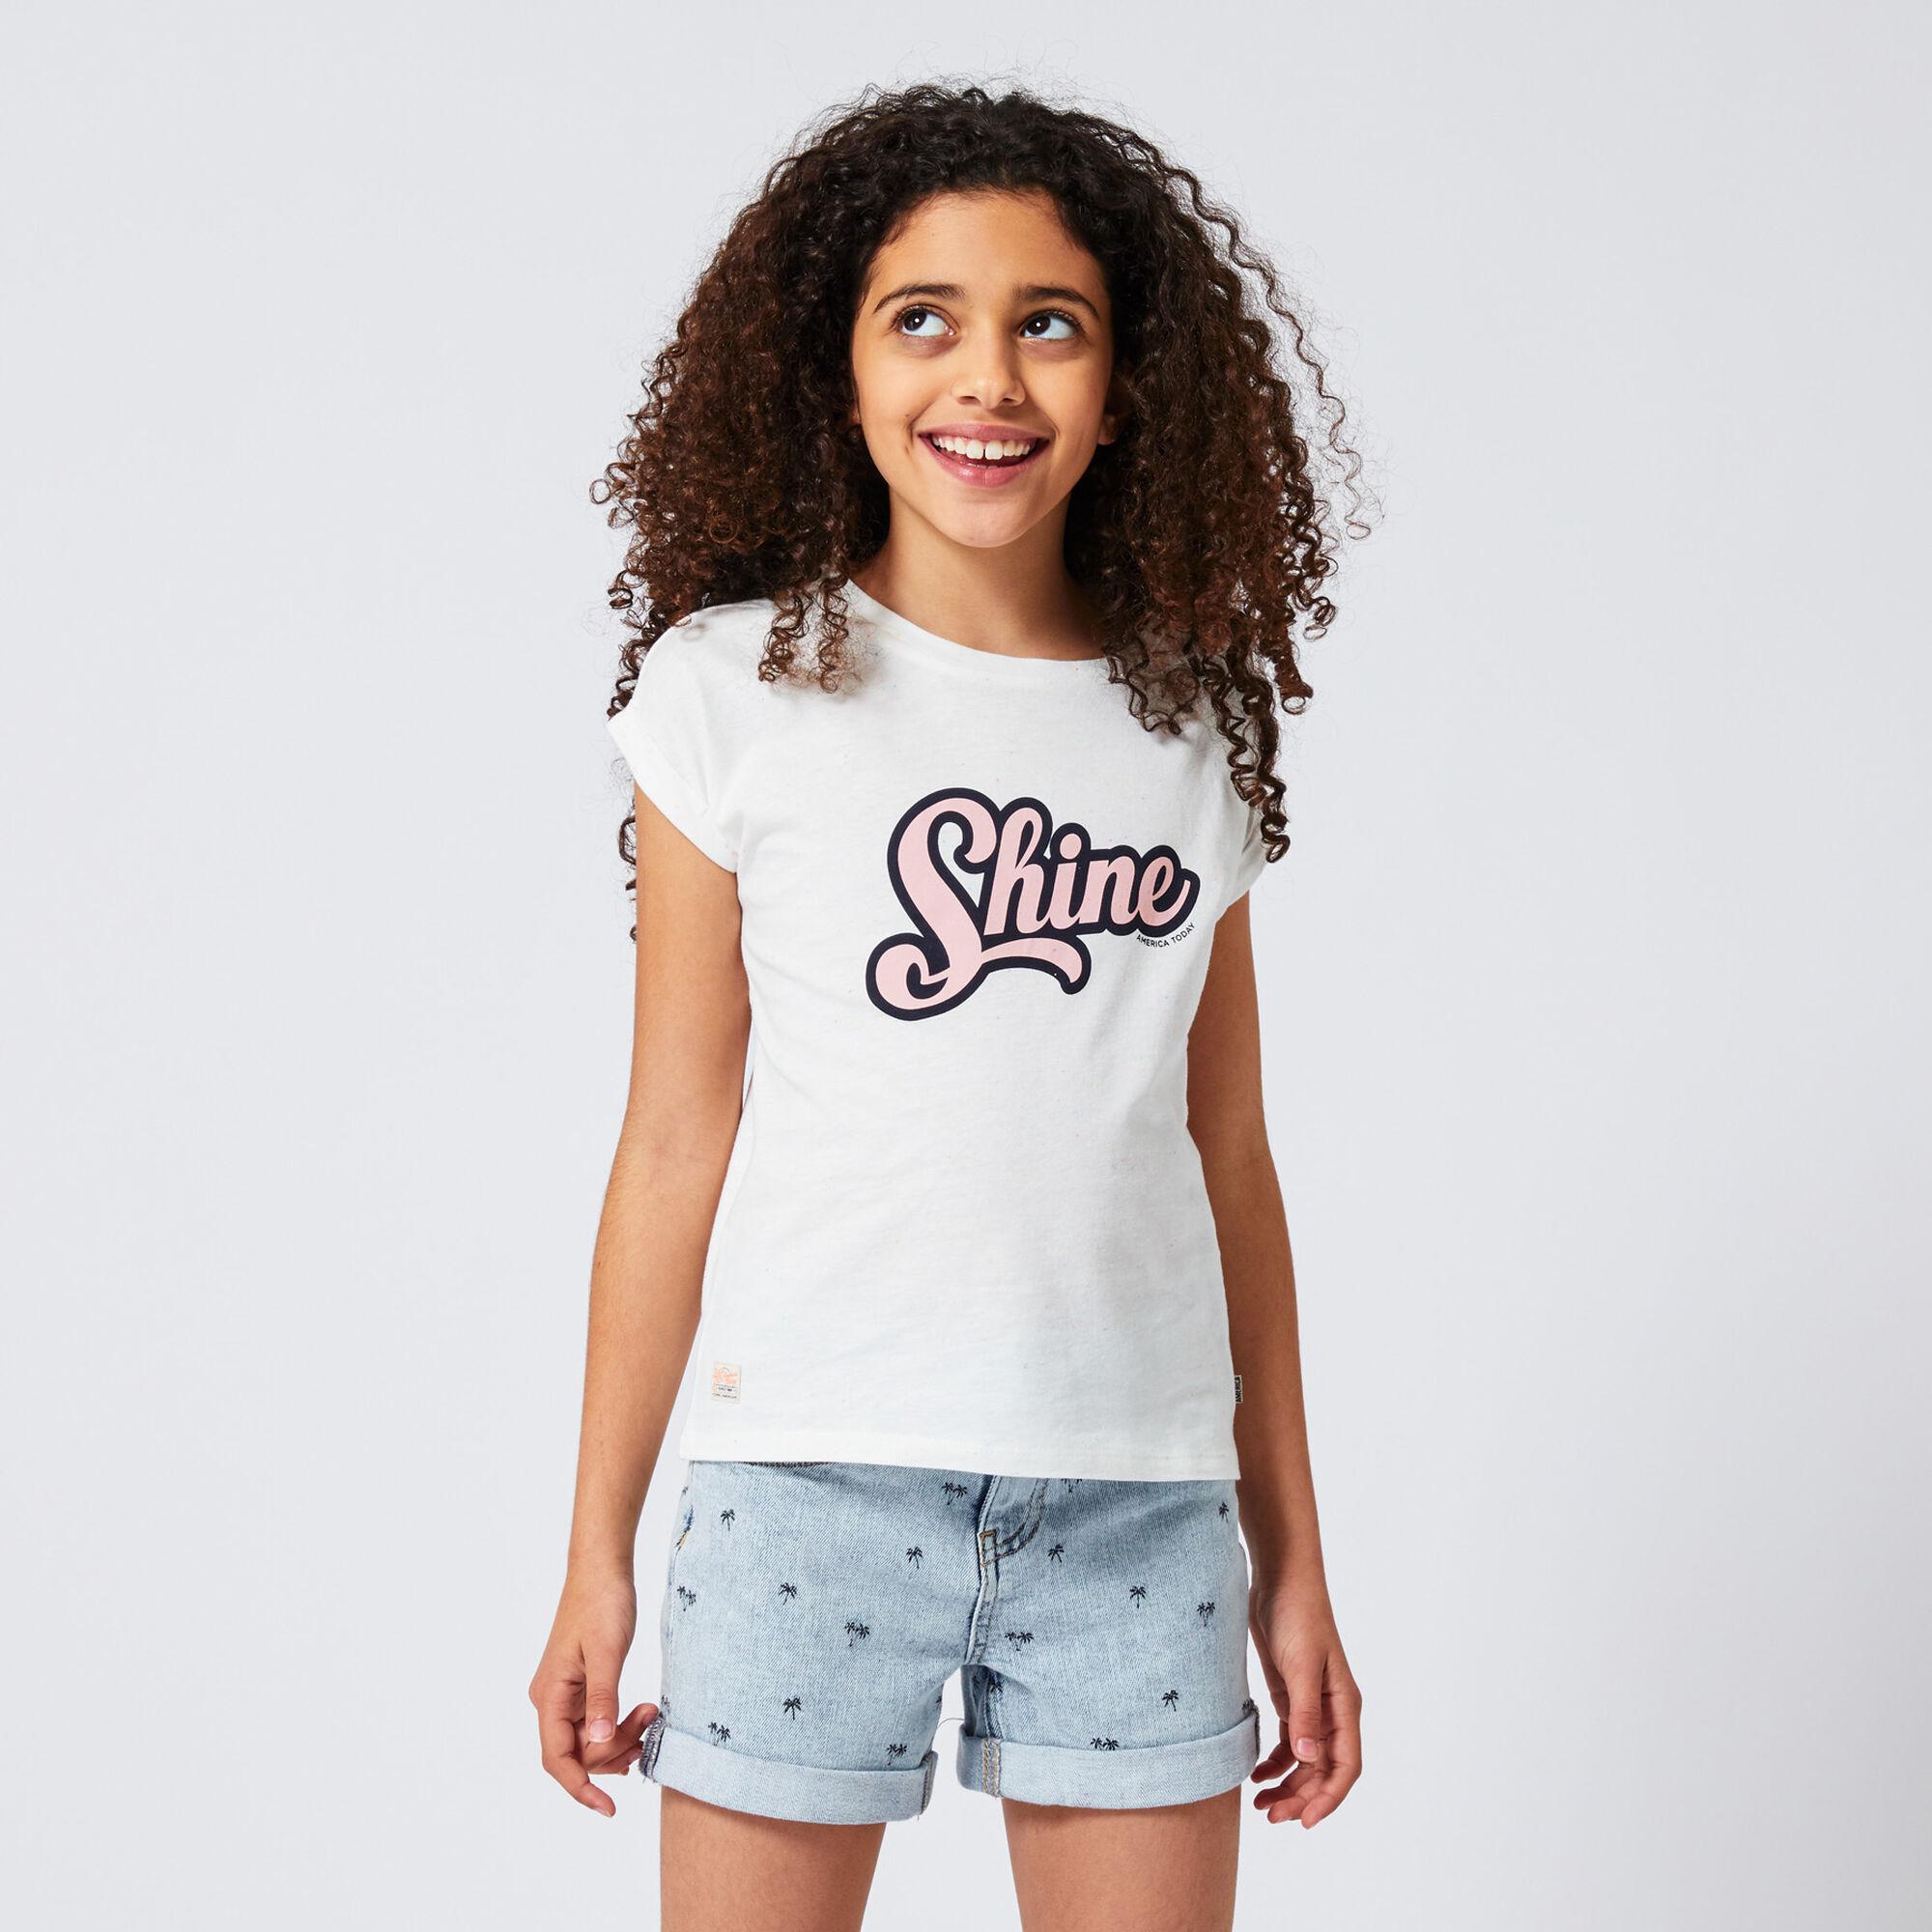 Stoere Kinderkleding.America Today Kinderkleding Kindermodeblog Girlslabel